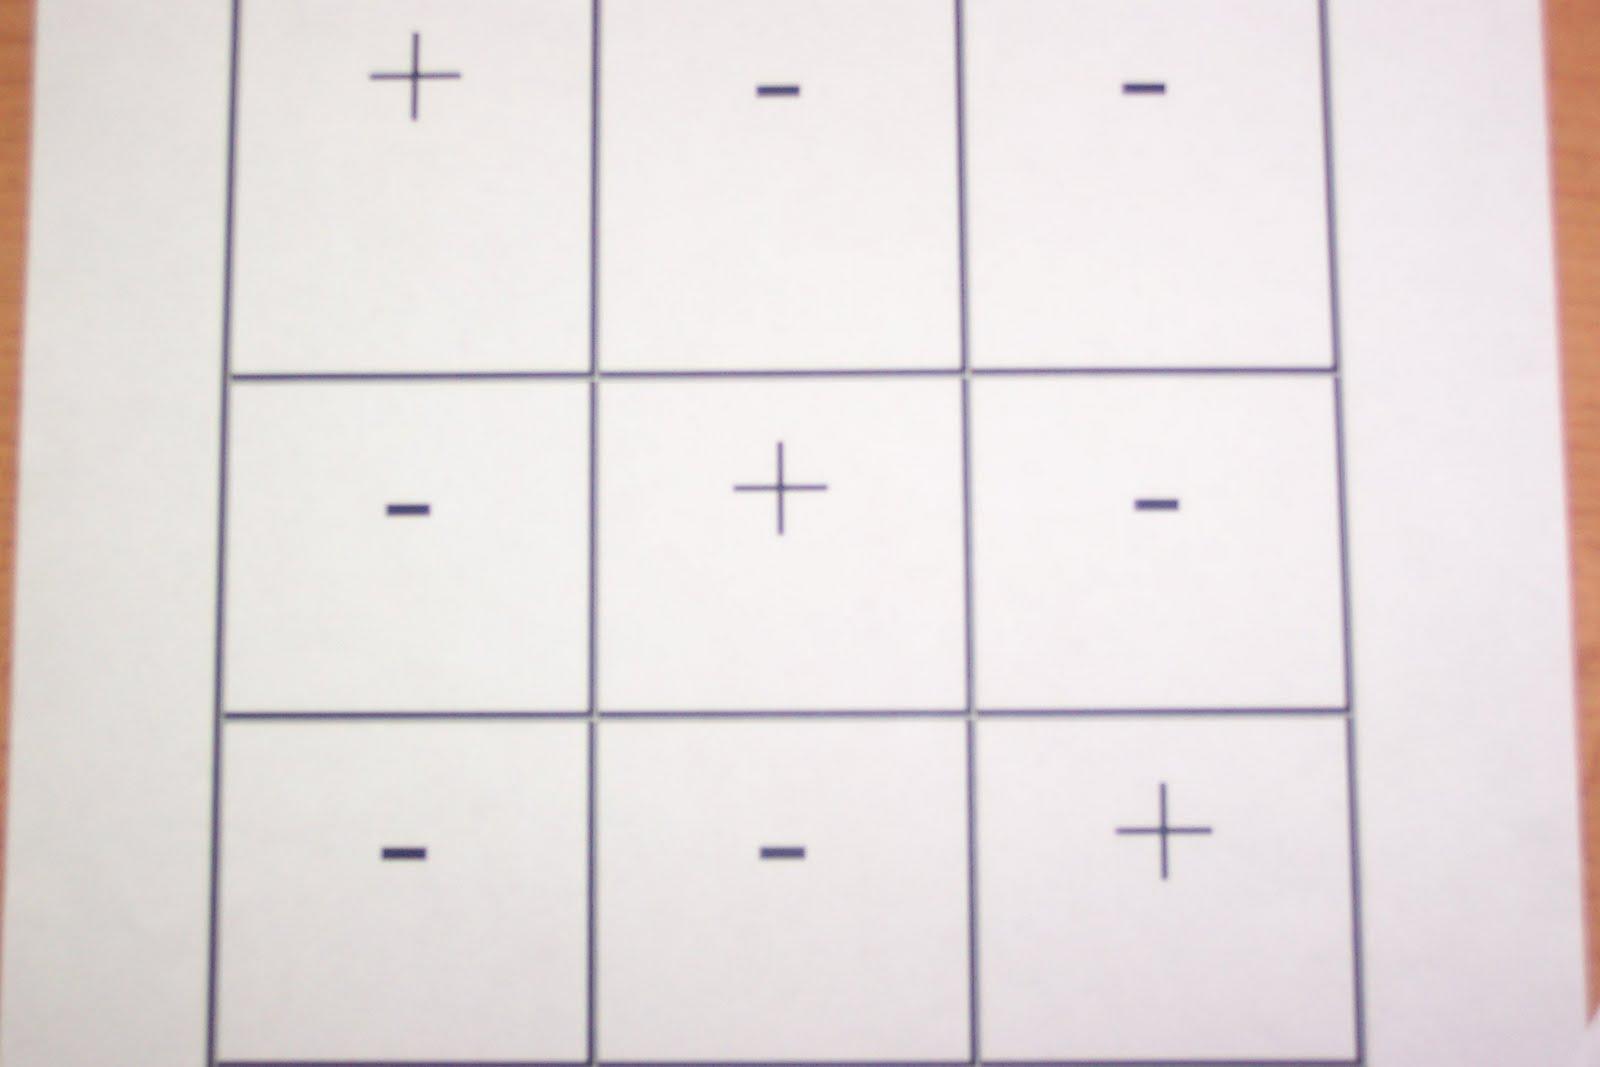 Multiplying/Dividing Integers   Mr. Fesko's 7th Grade Math Class